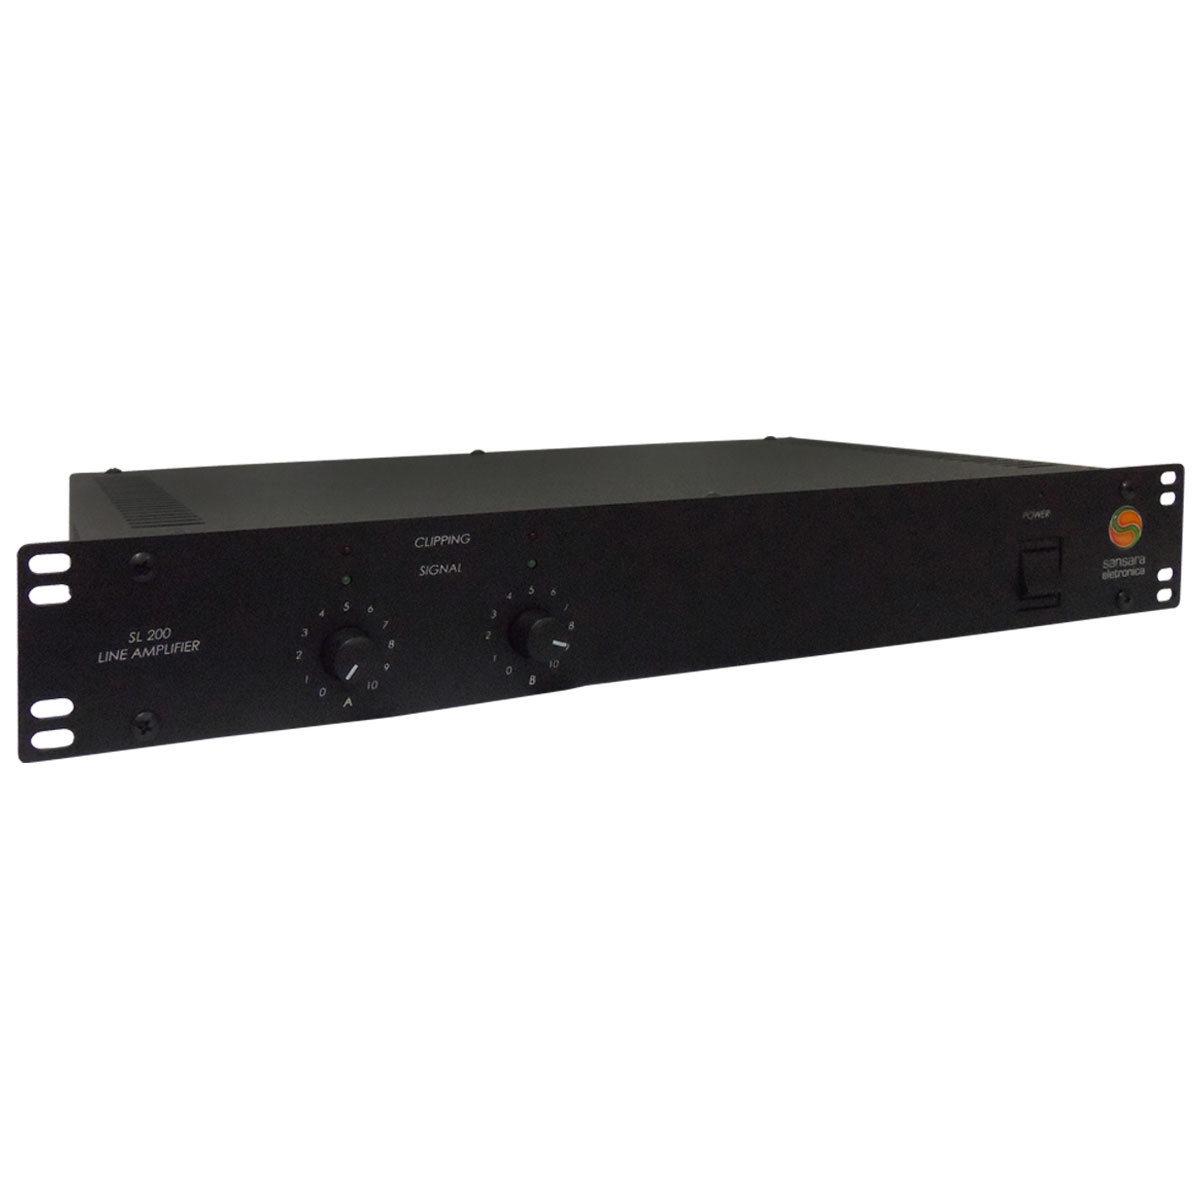 SL200 - Amplificador de Linha Mono / Est�reo 200W SL 200 - Sansara